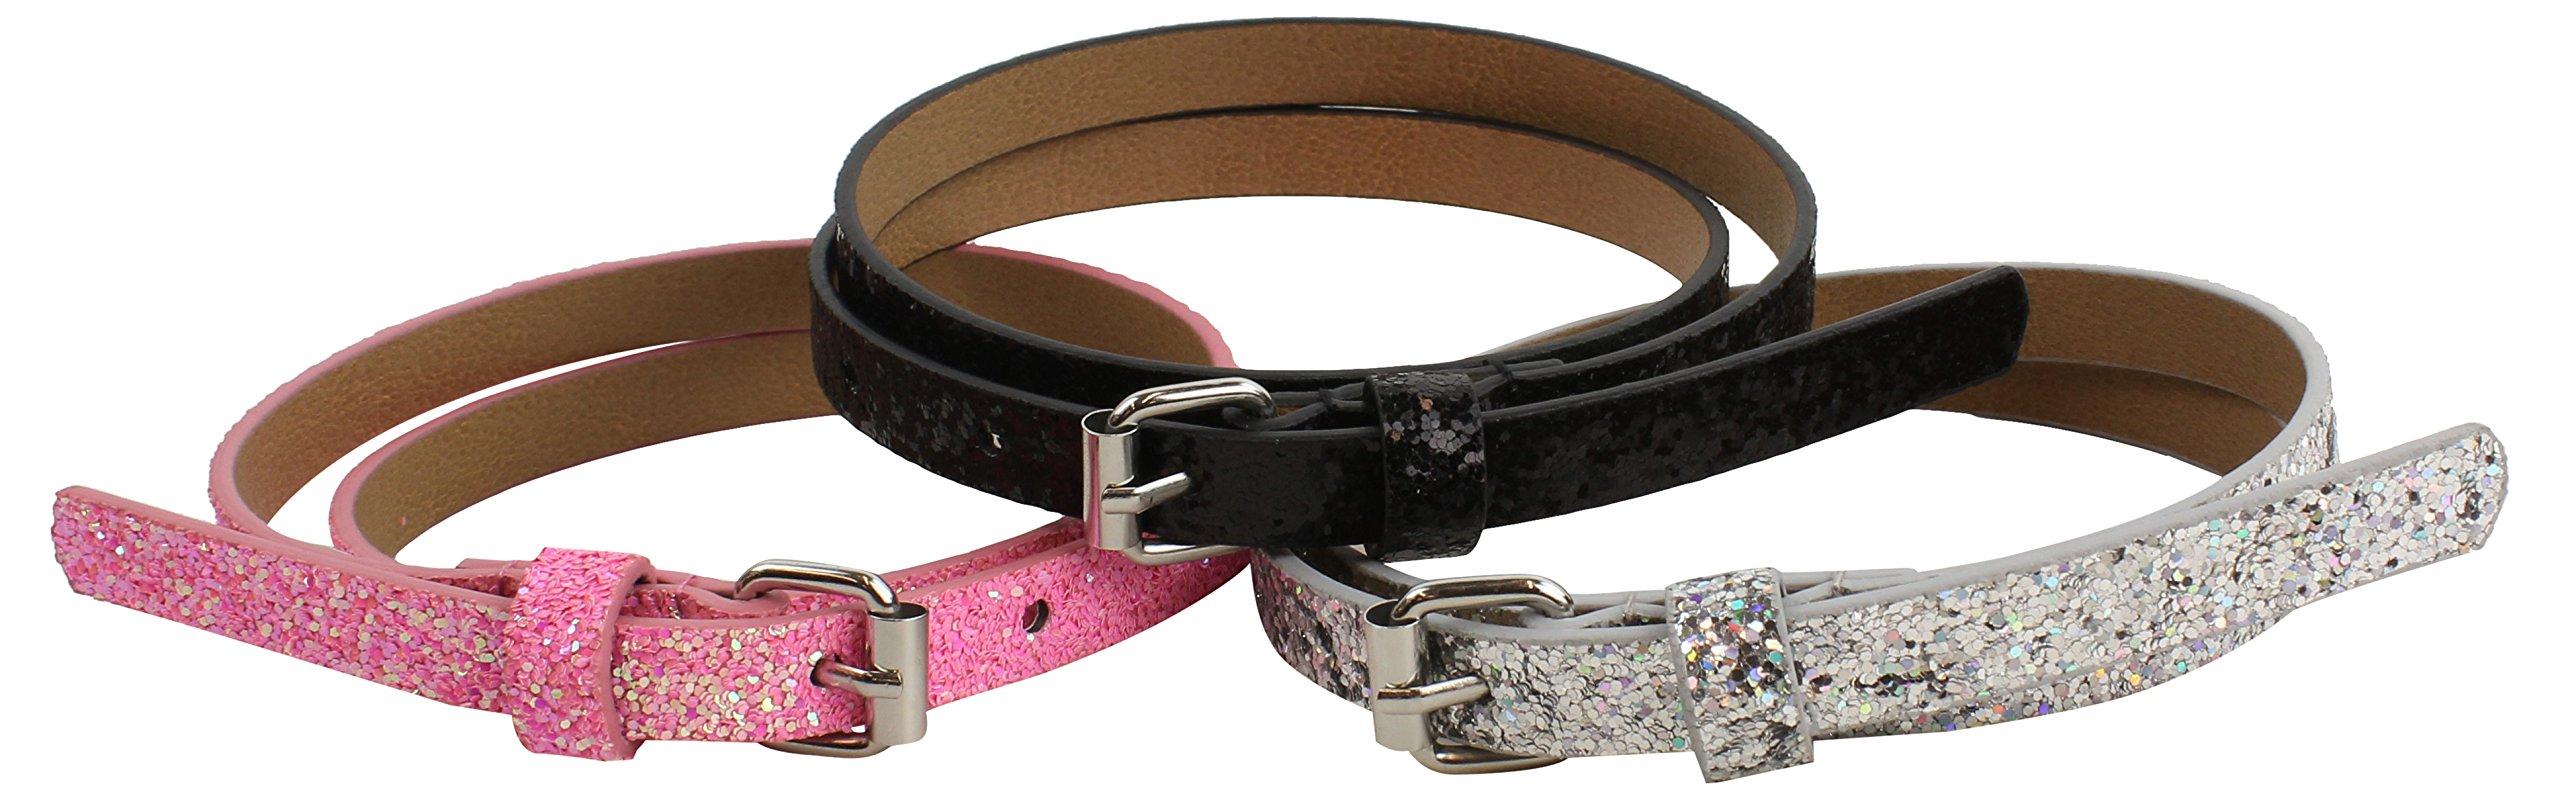 On the Verge Little Girls' 3 Pack Belts, Pink/Black/Silver, Medium/Large